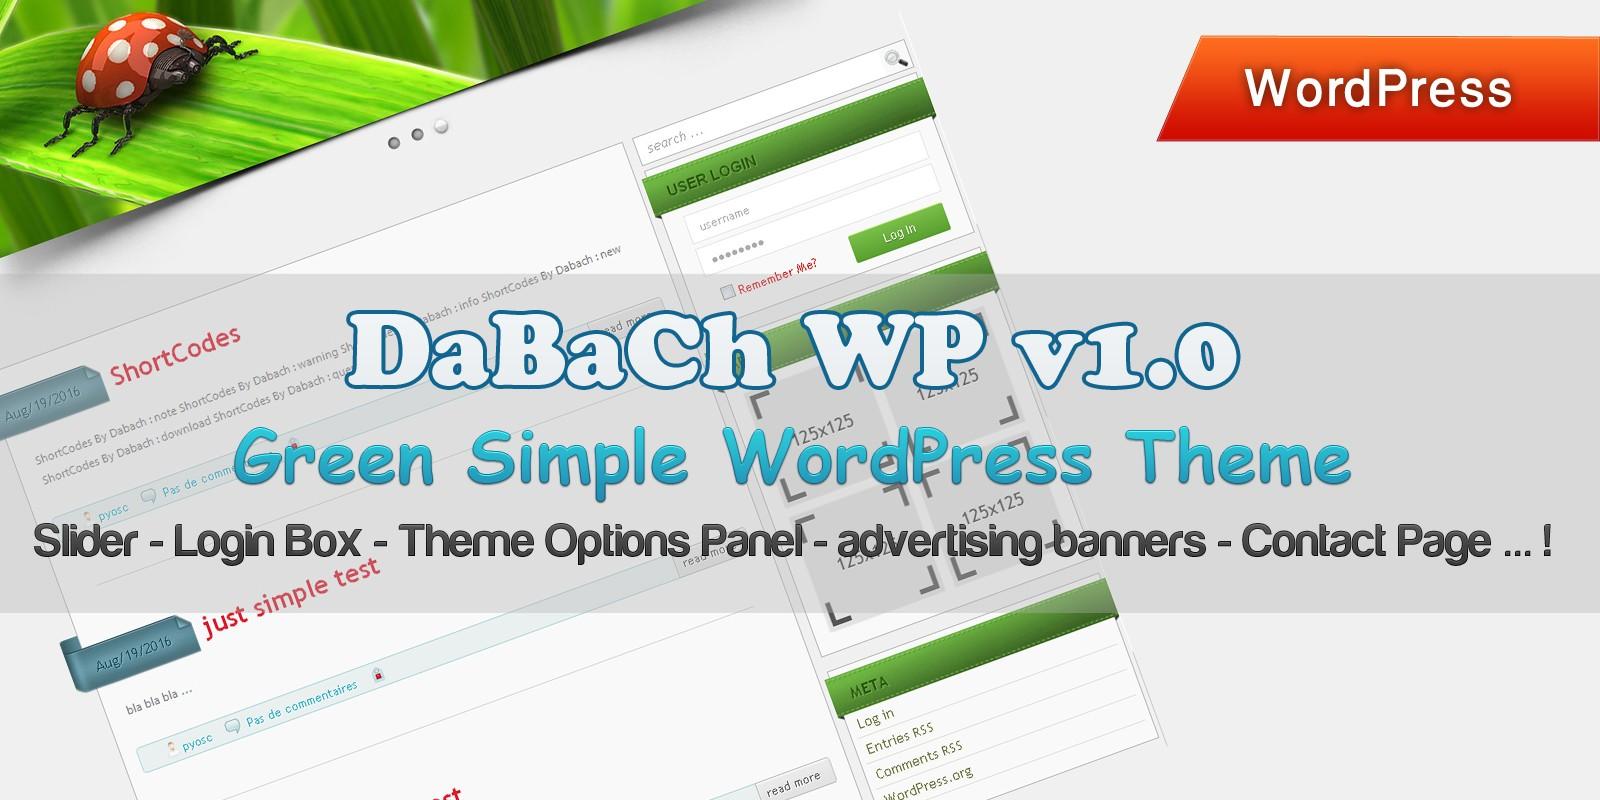 DaBaCh WP - Green Simple WordPress Theme